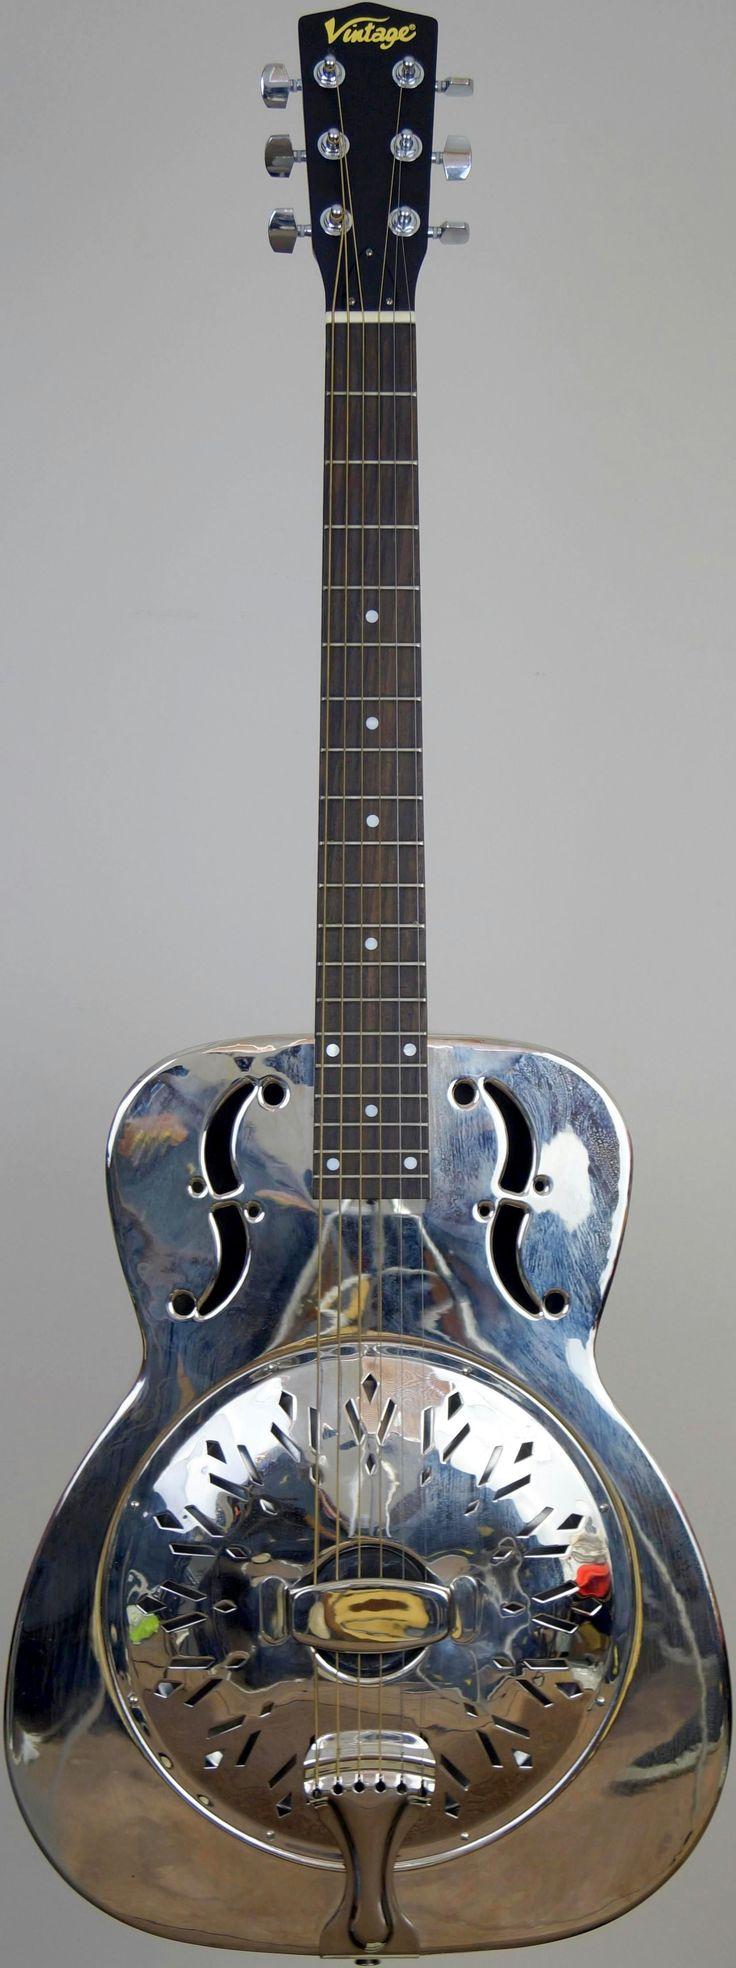 Univox Electric Guitar Wiring Schematics Kay Diagram Resonator Images Gallery 736x1968